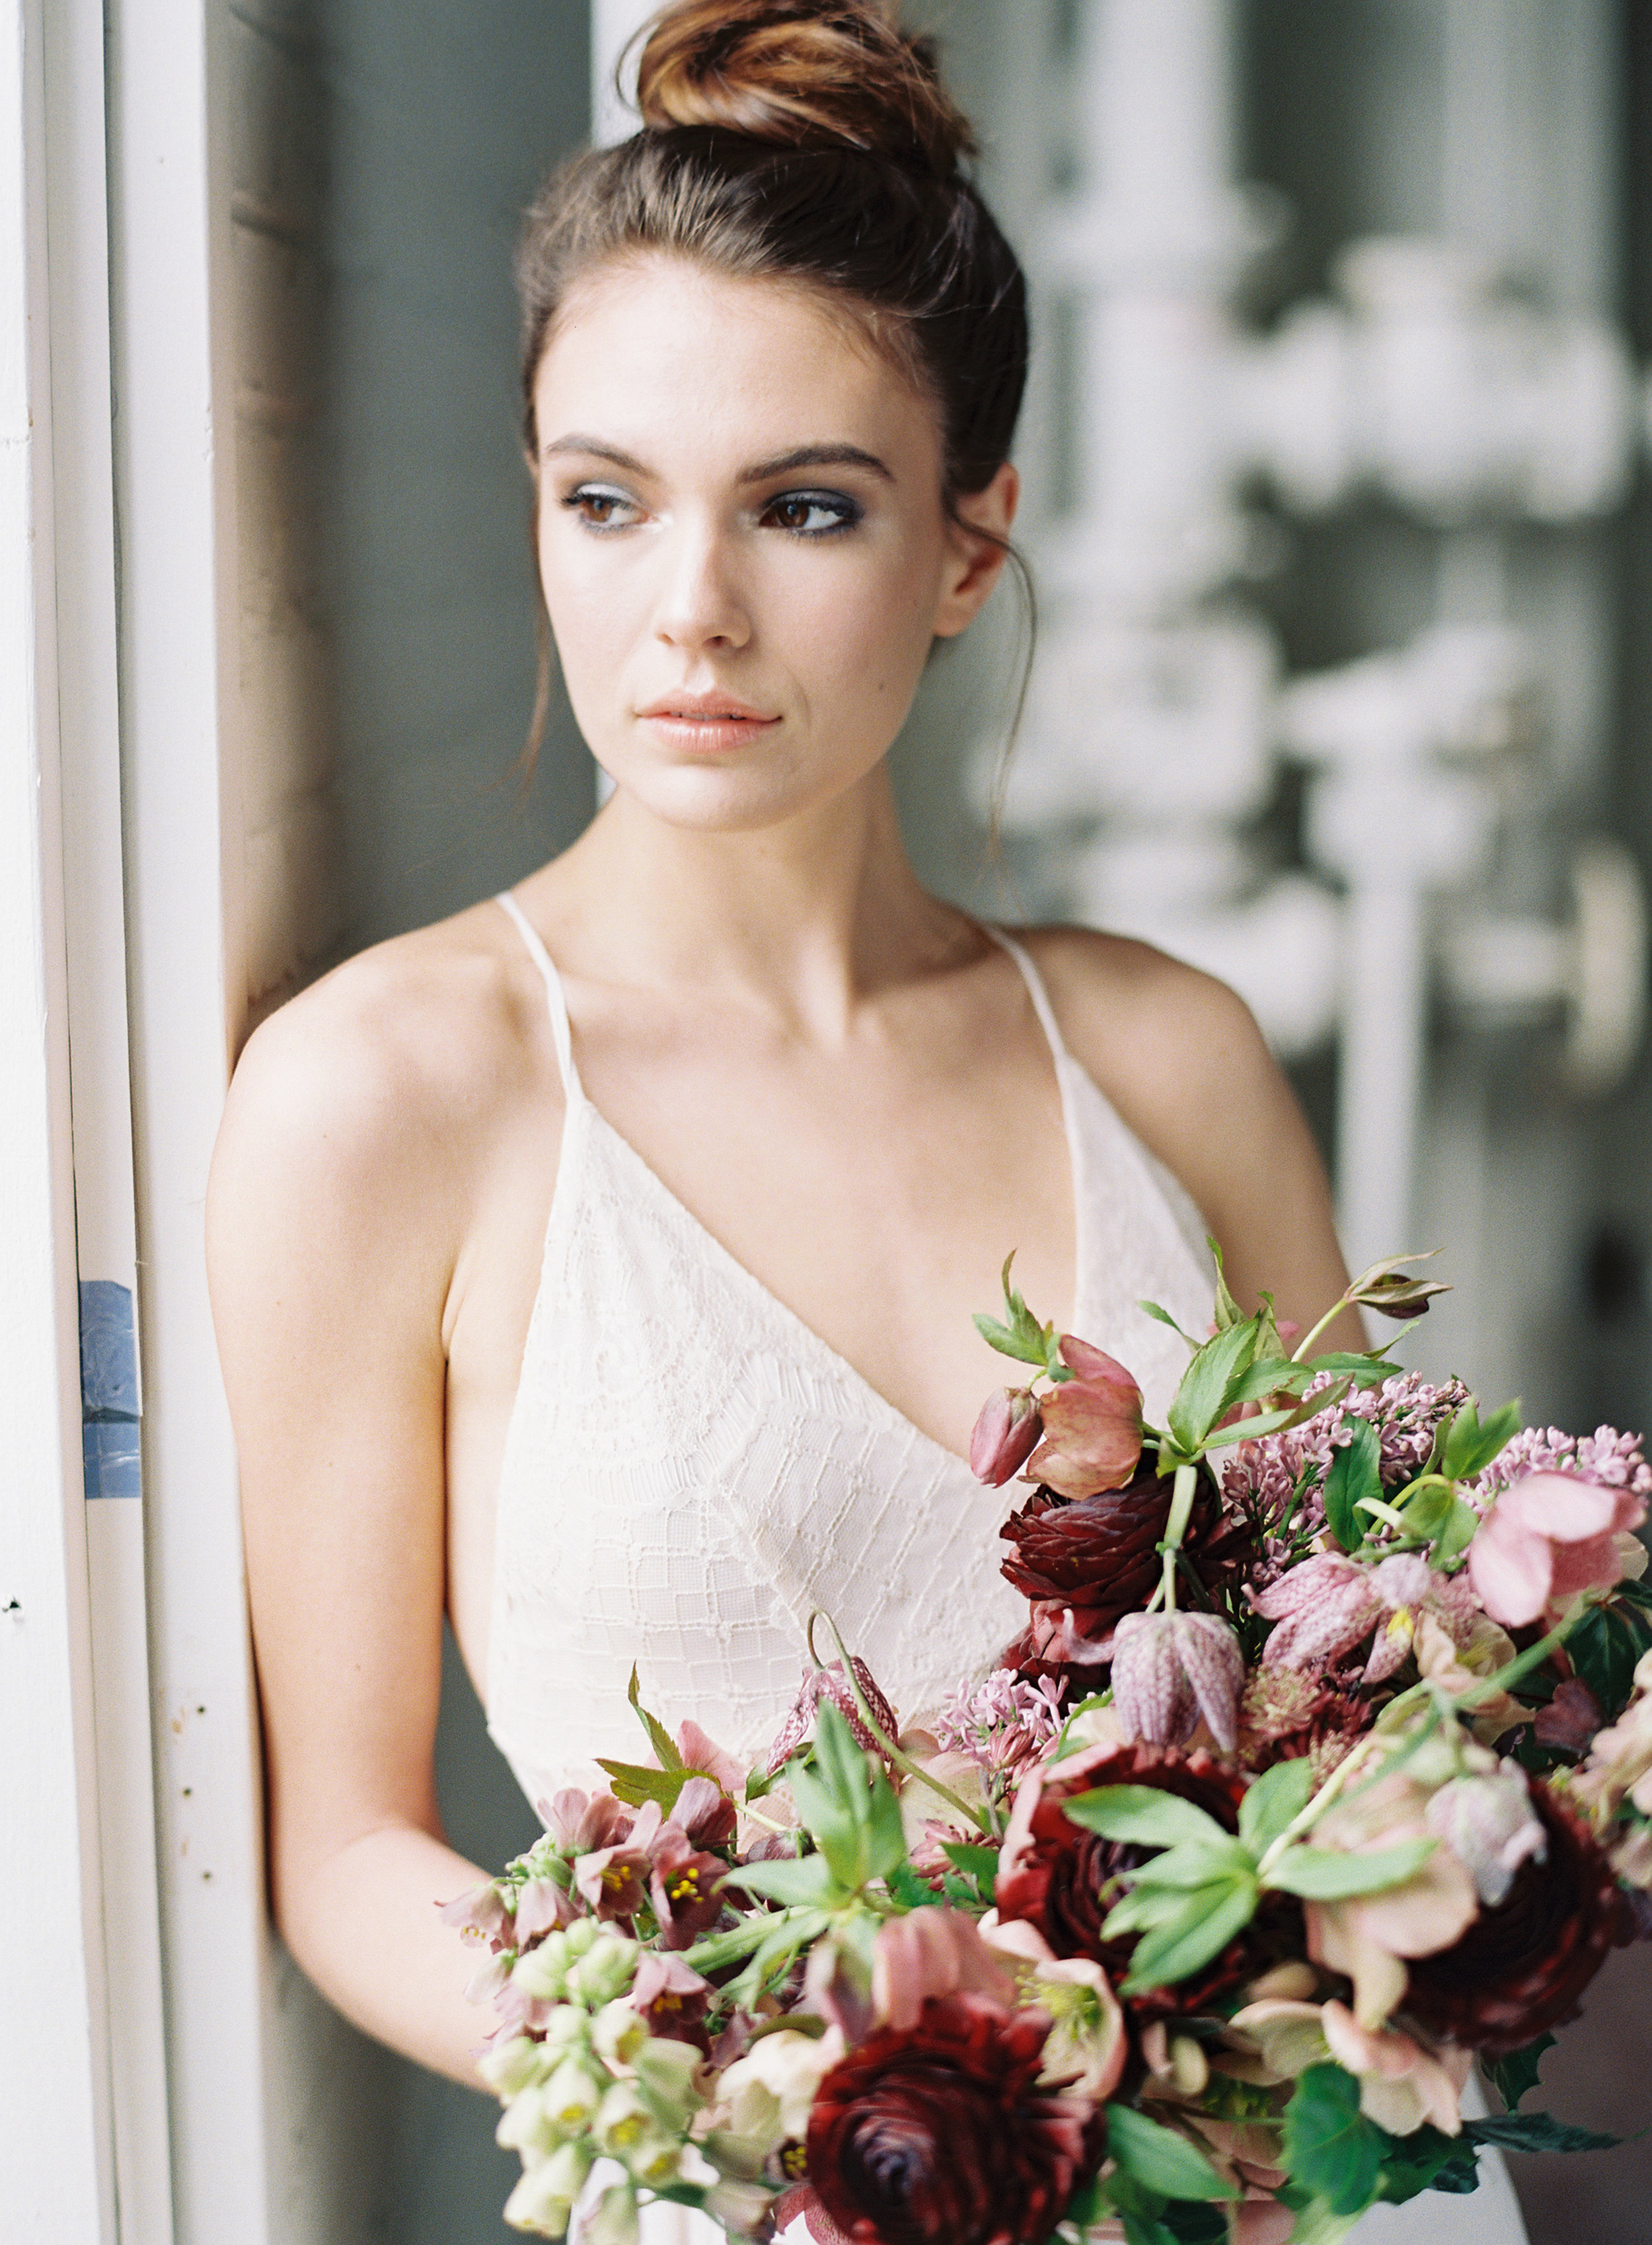 All Floral Images-0131.jpg